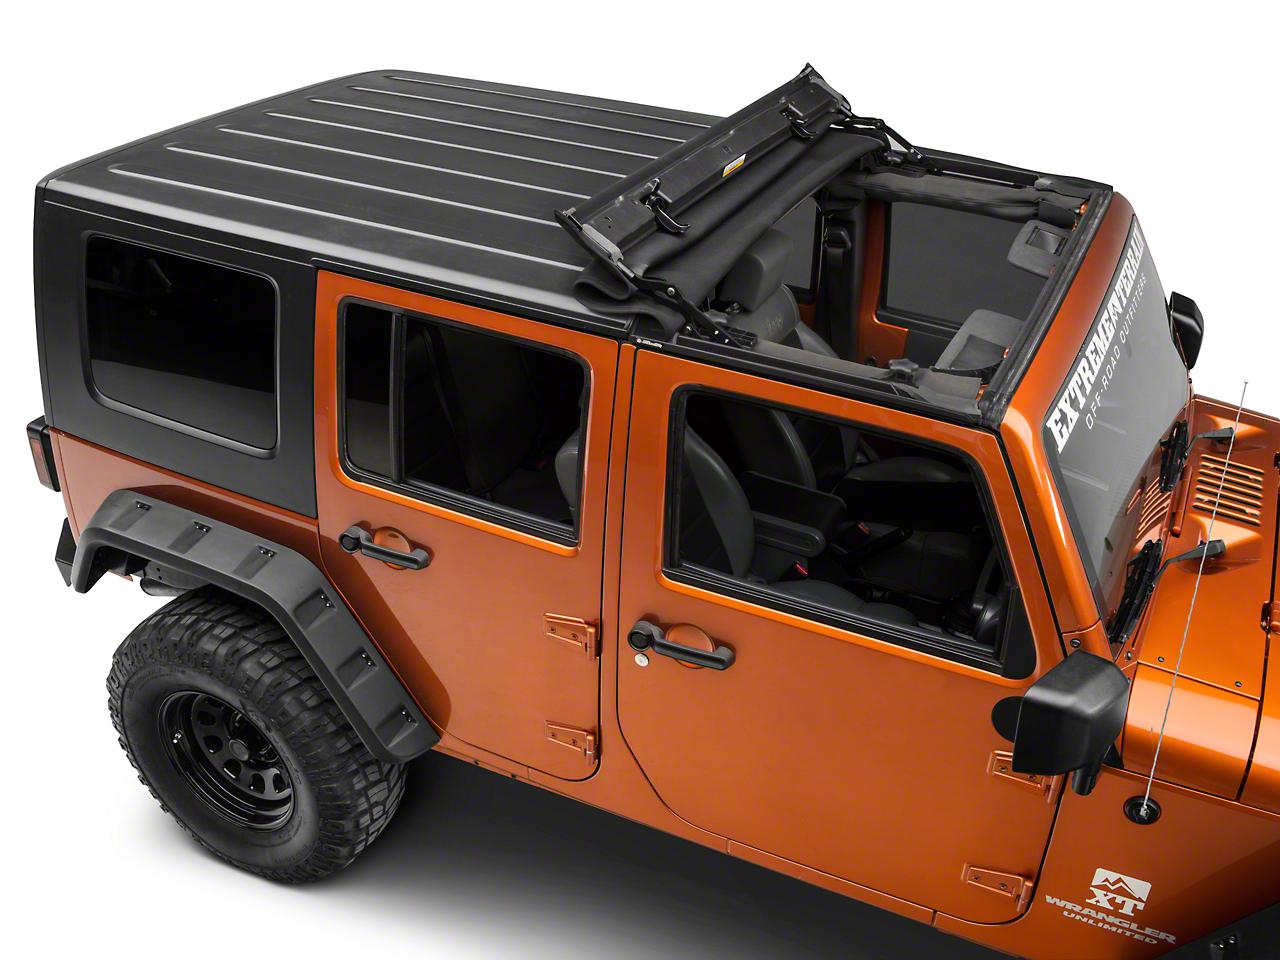 Bestop Sunrider for Hardtop - Black Twill (07-18 Jeep Wrangler JK)